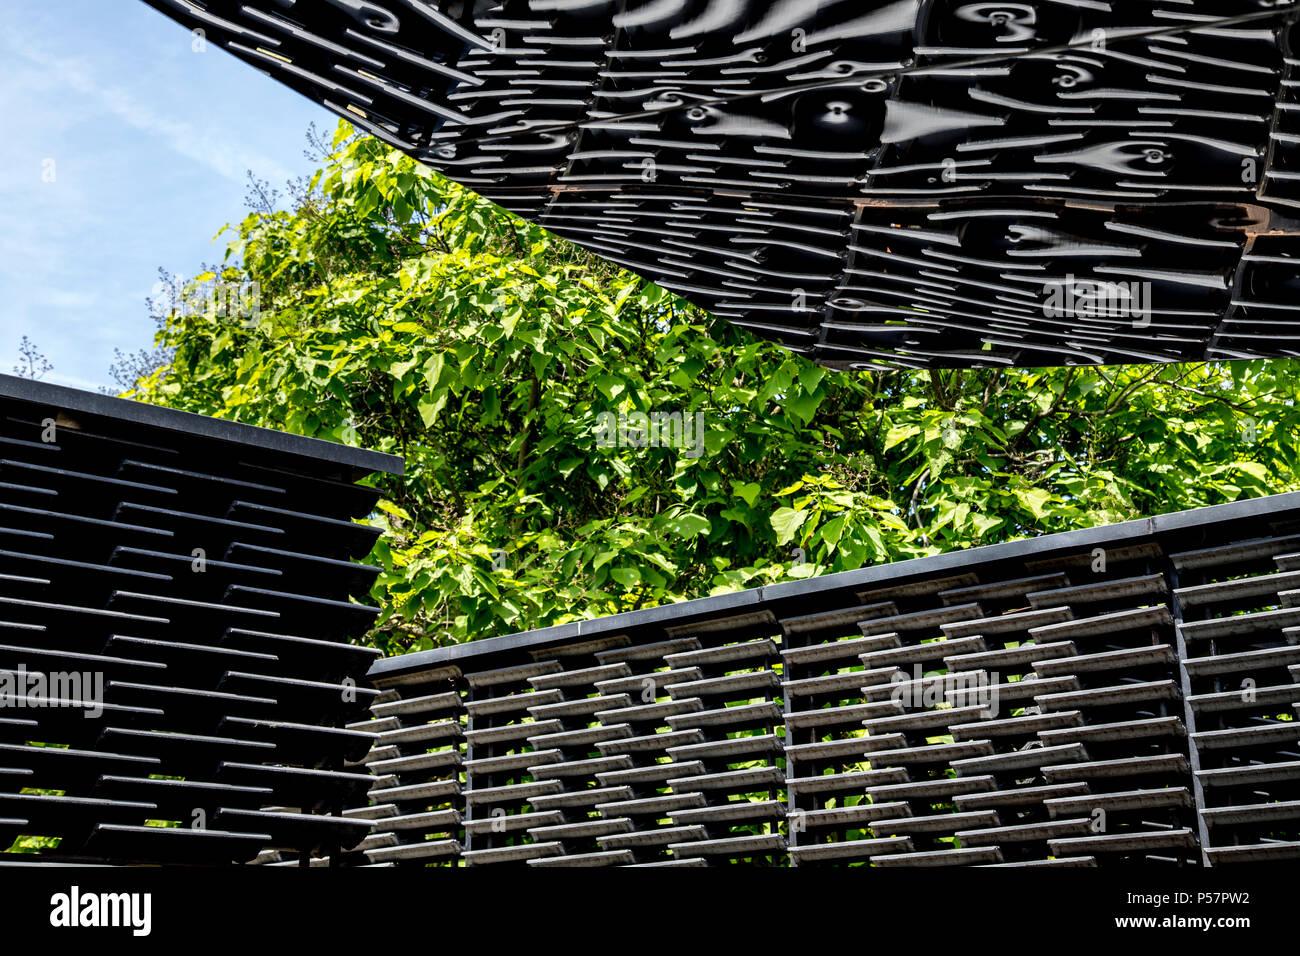 Die Serpentine Pavillon 2018 von Frida Escobedo im Hyde Park, London, UK Stockbild